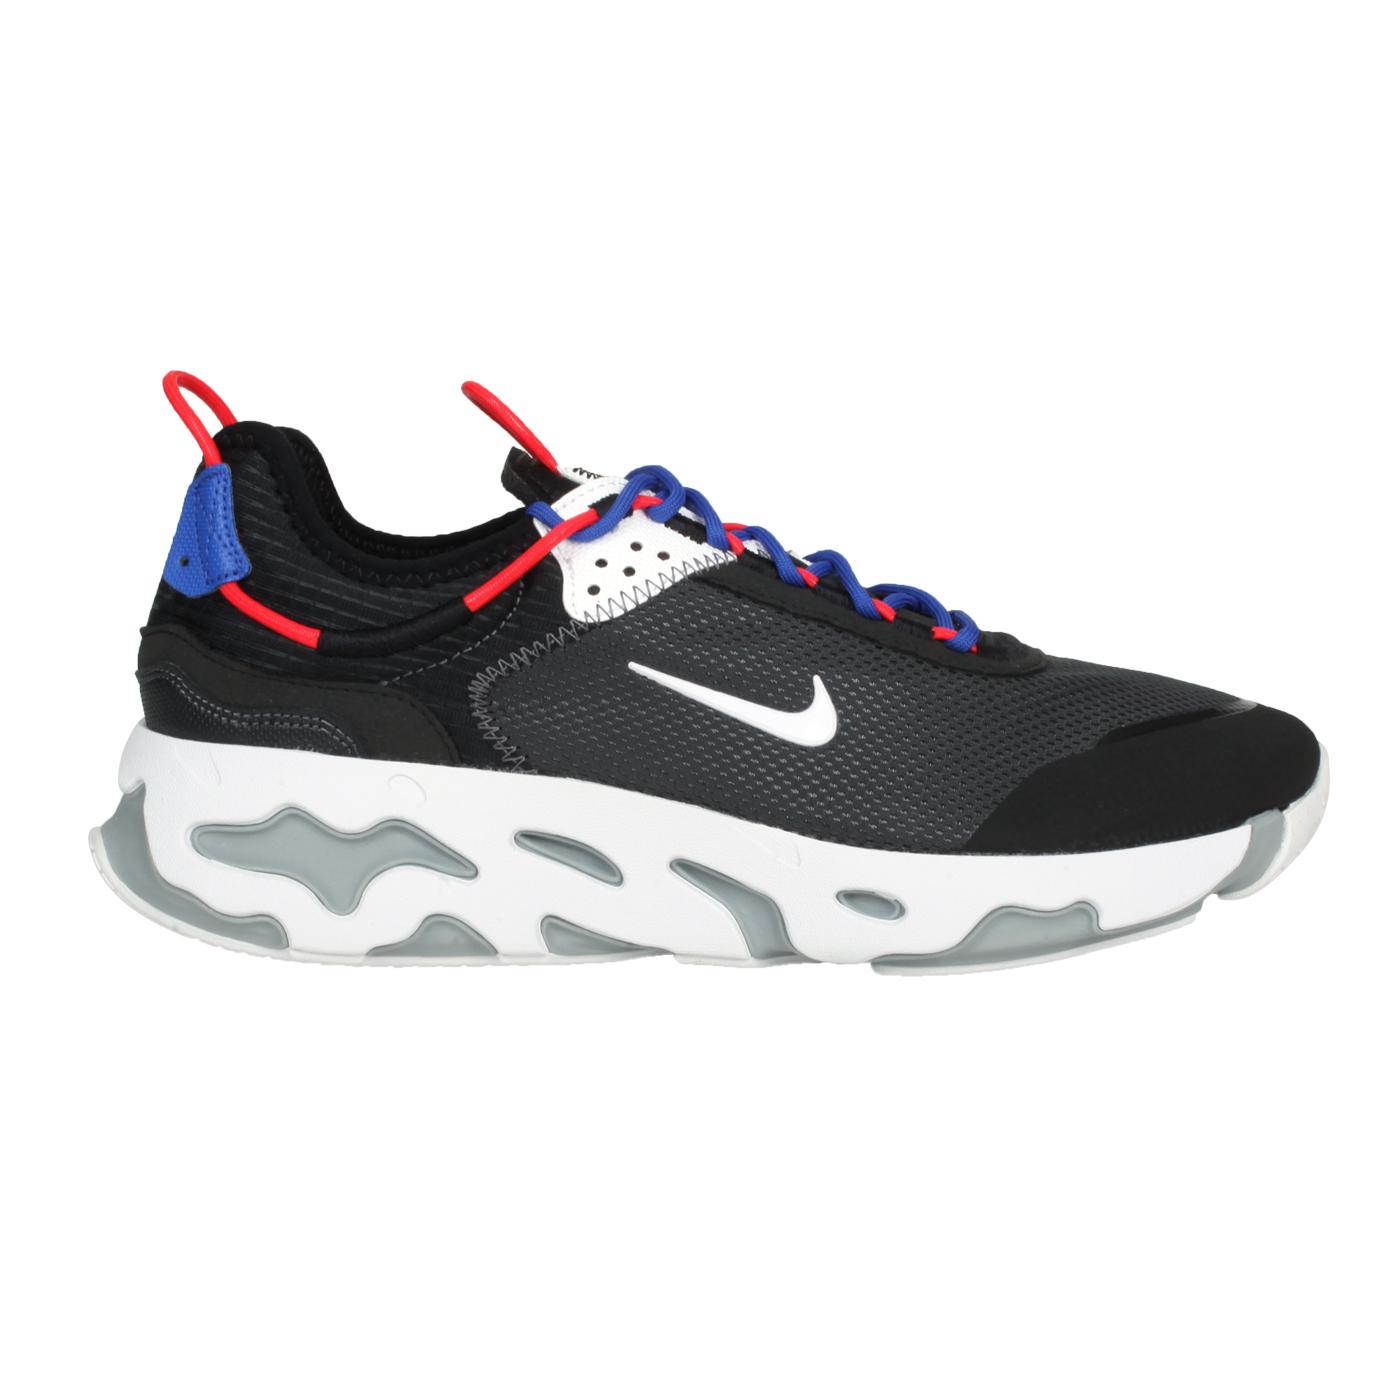 NIKE 男款休閒運動鞋  @REACT LIVE@CV1772001 - 黑白紅藍